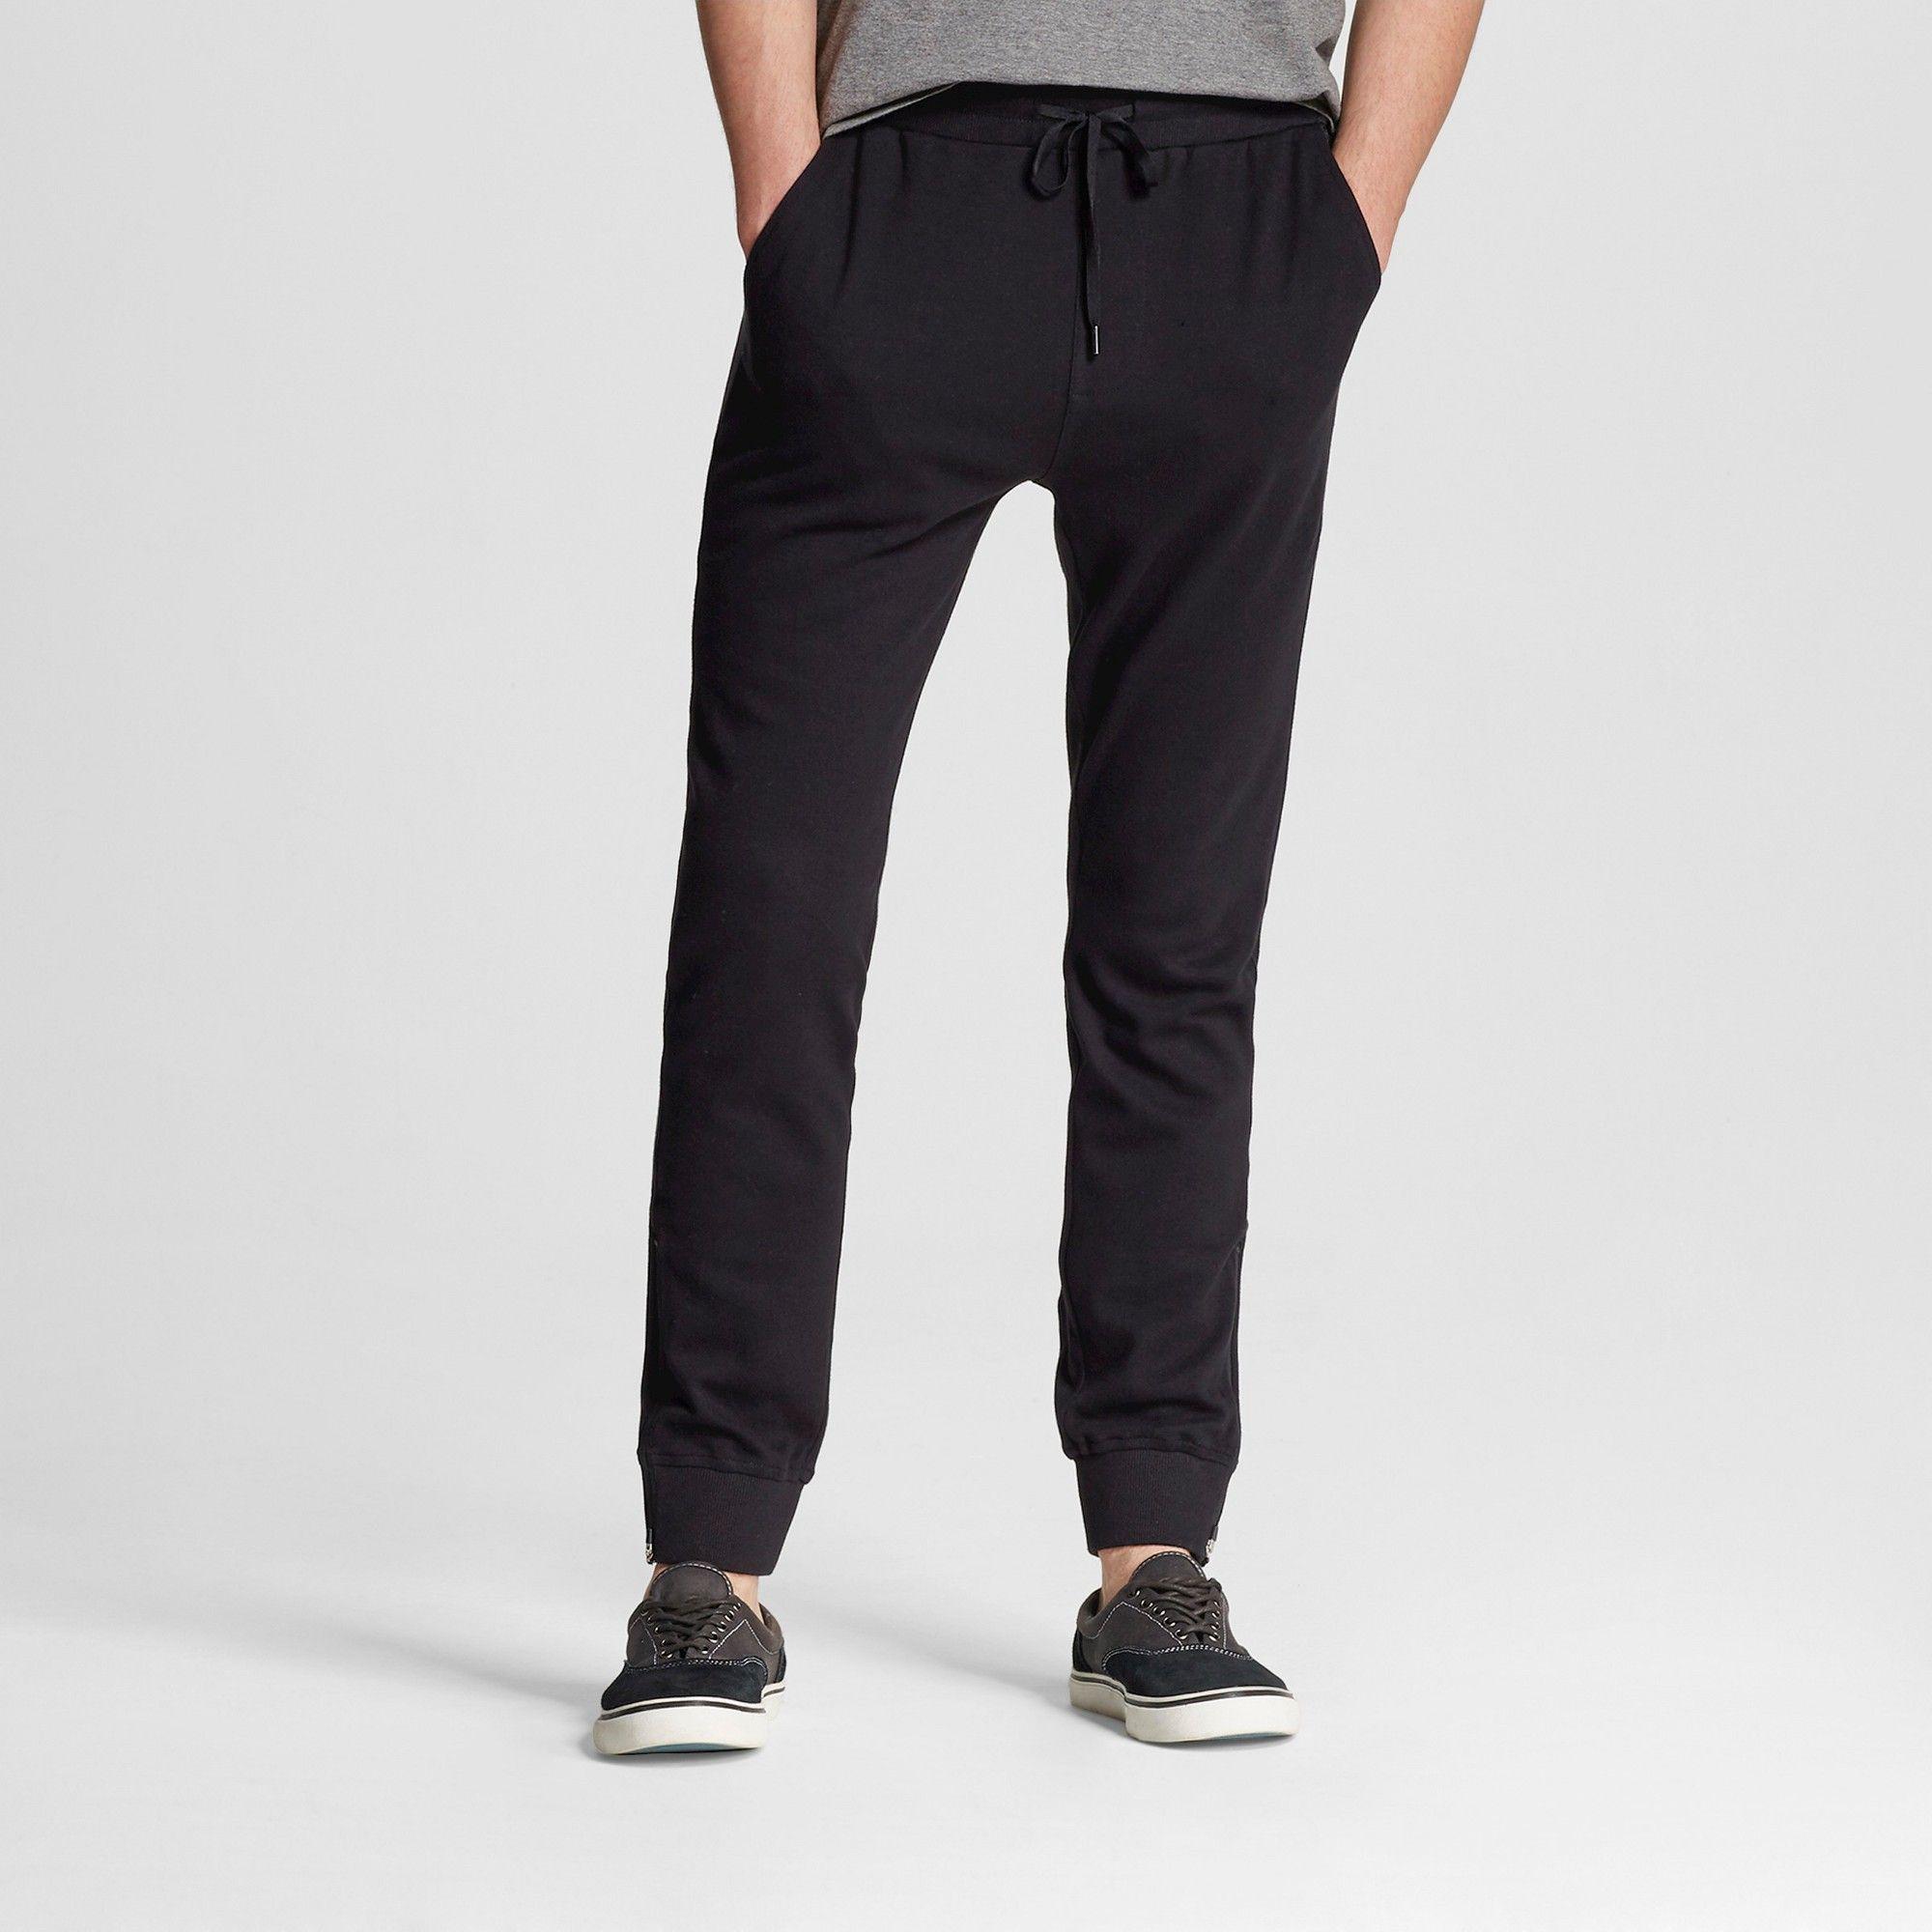 b8fd2677b005b2 Men's Jogger Pants Black L - Mossimo Supply Co. | Products | Mens ...